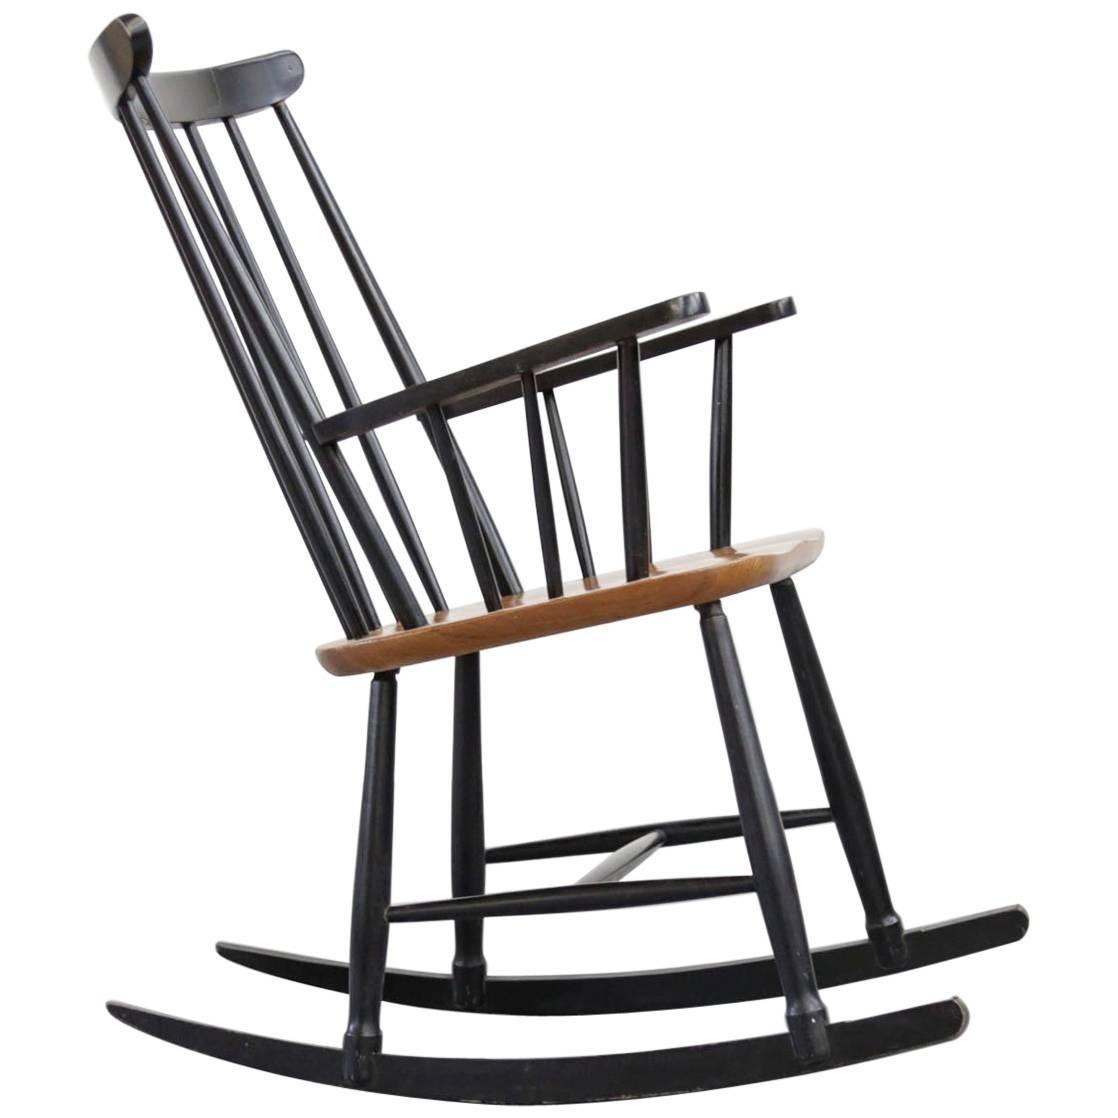 Rocking Chair Tapiovaara Model Fanett Scandinavian, 1960s